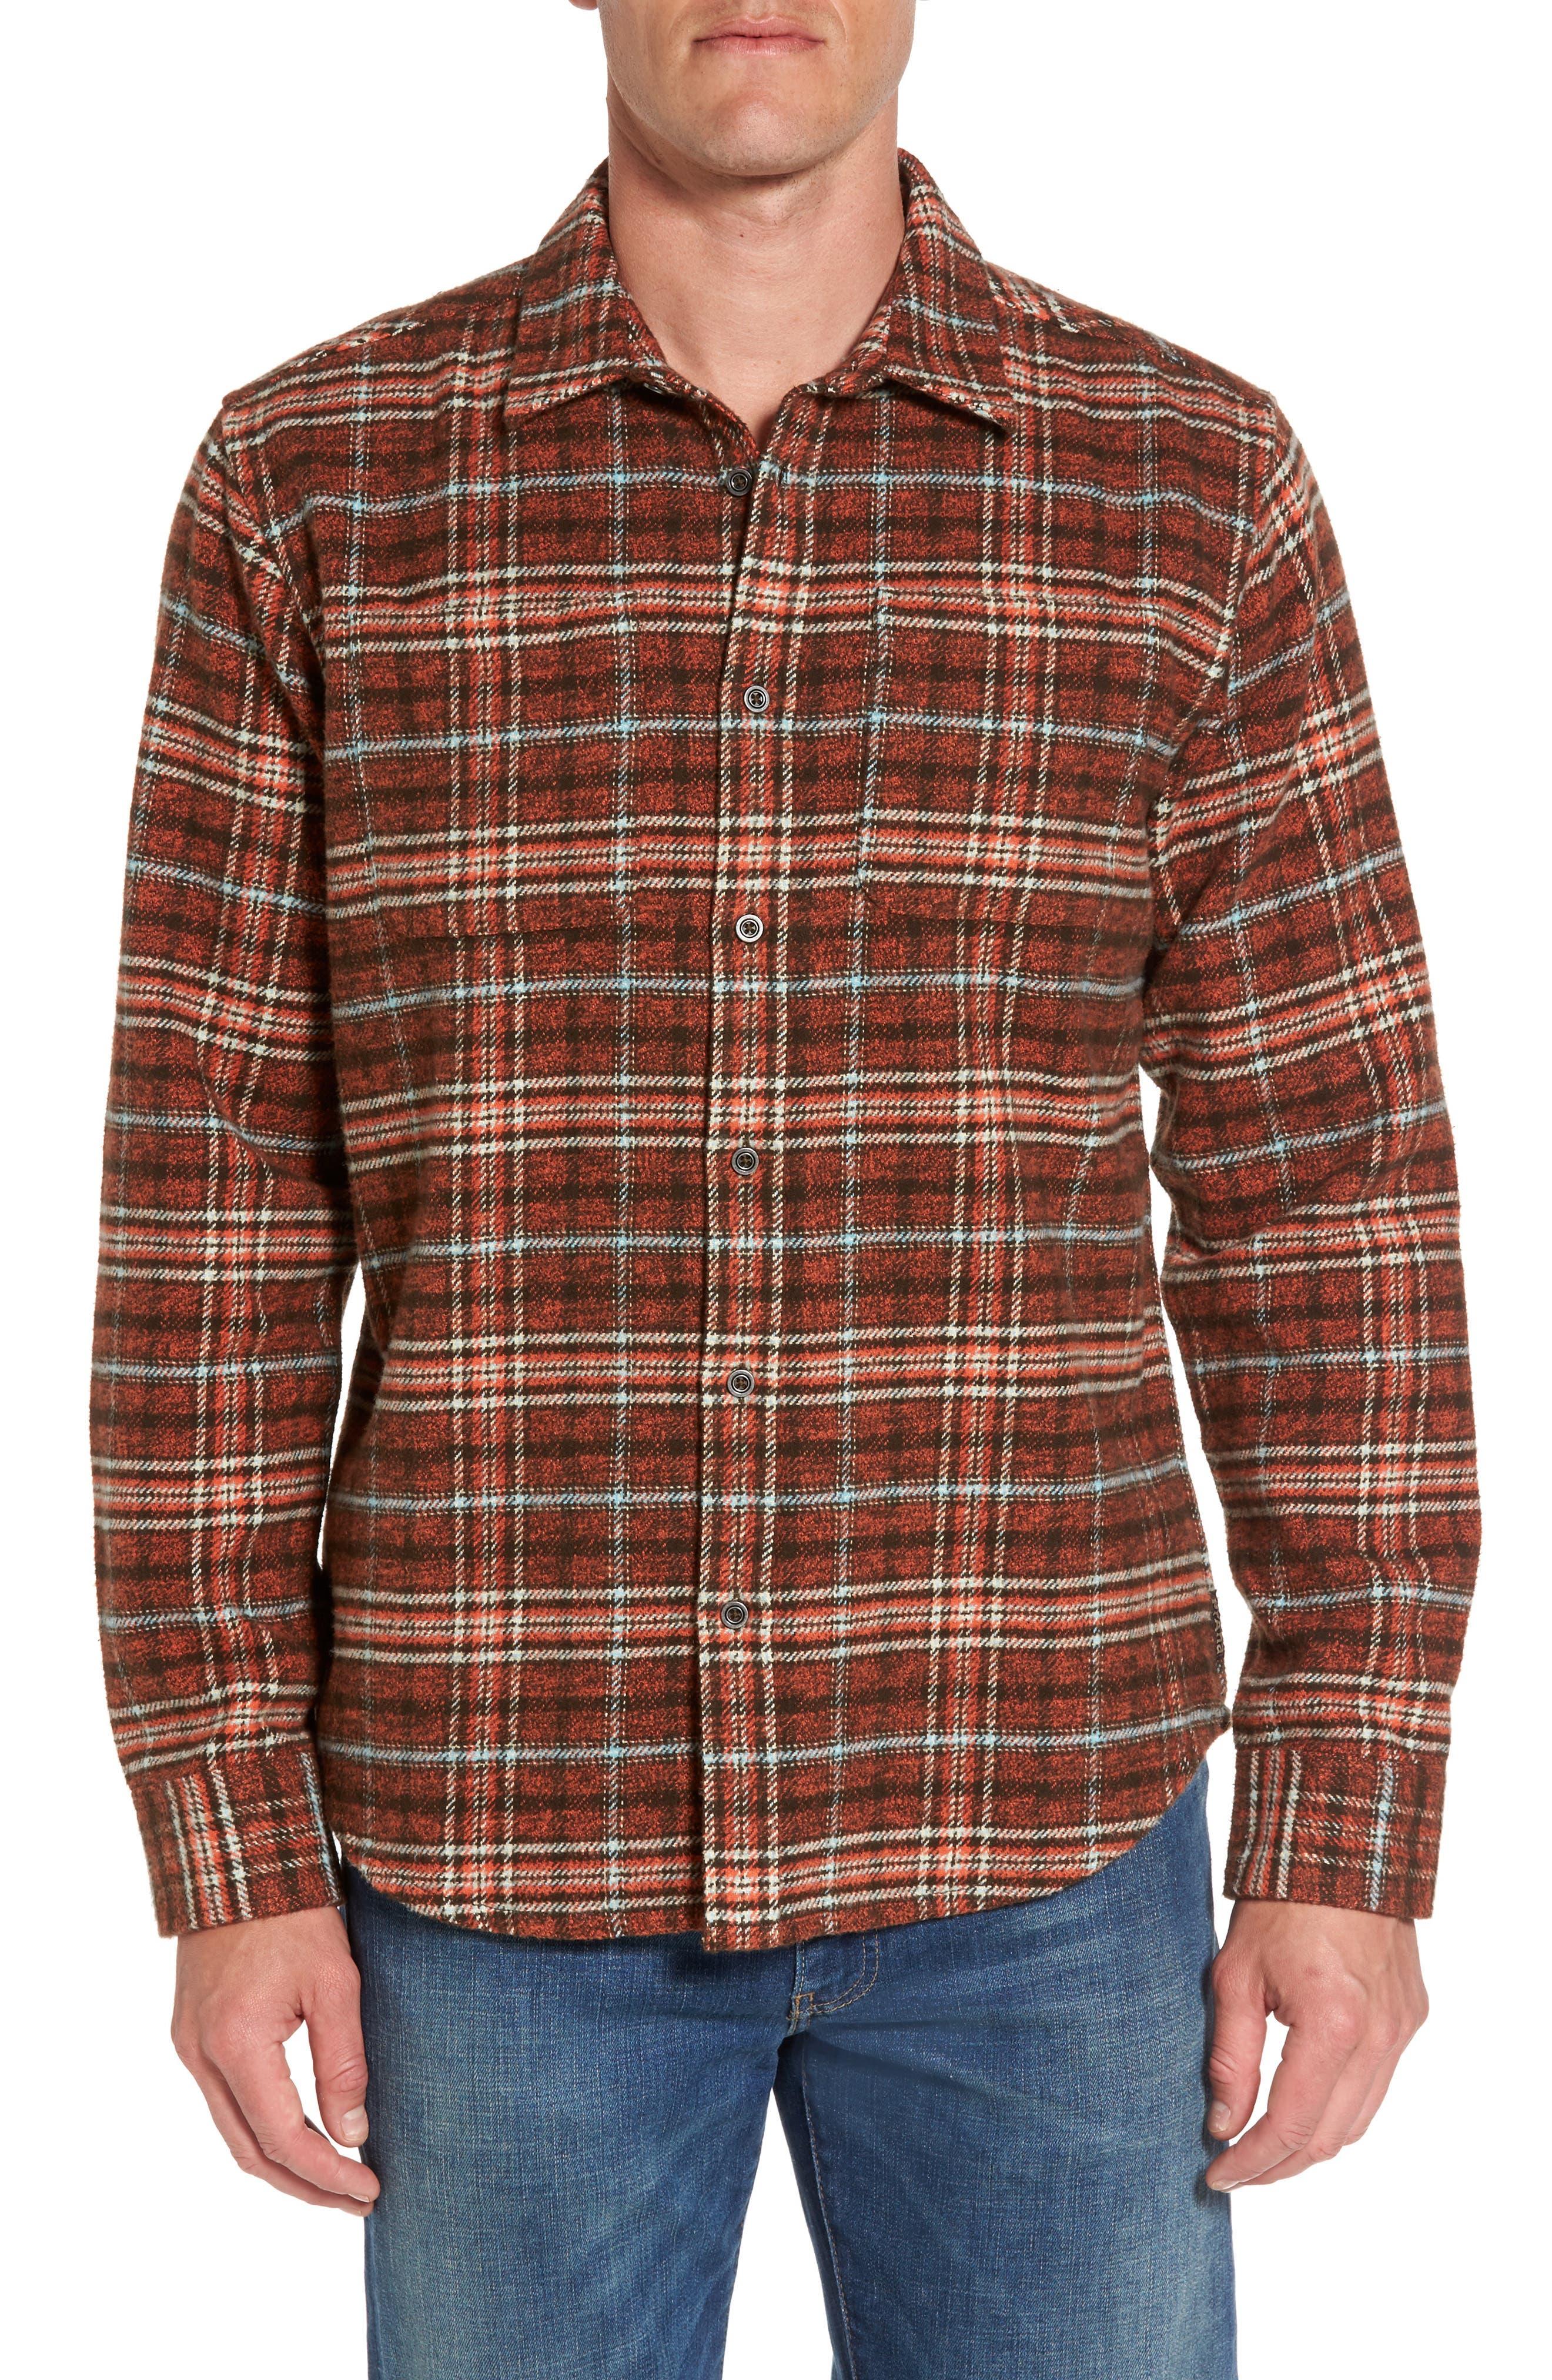 Brayden Regular Fit Plaid Flannel Shirt,                             Main thumbnail 2, color,